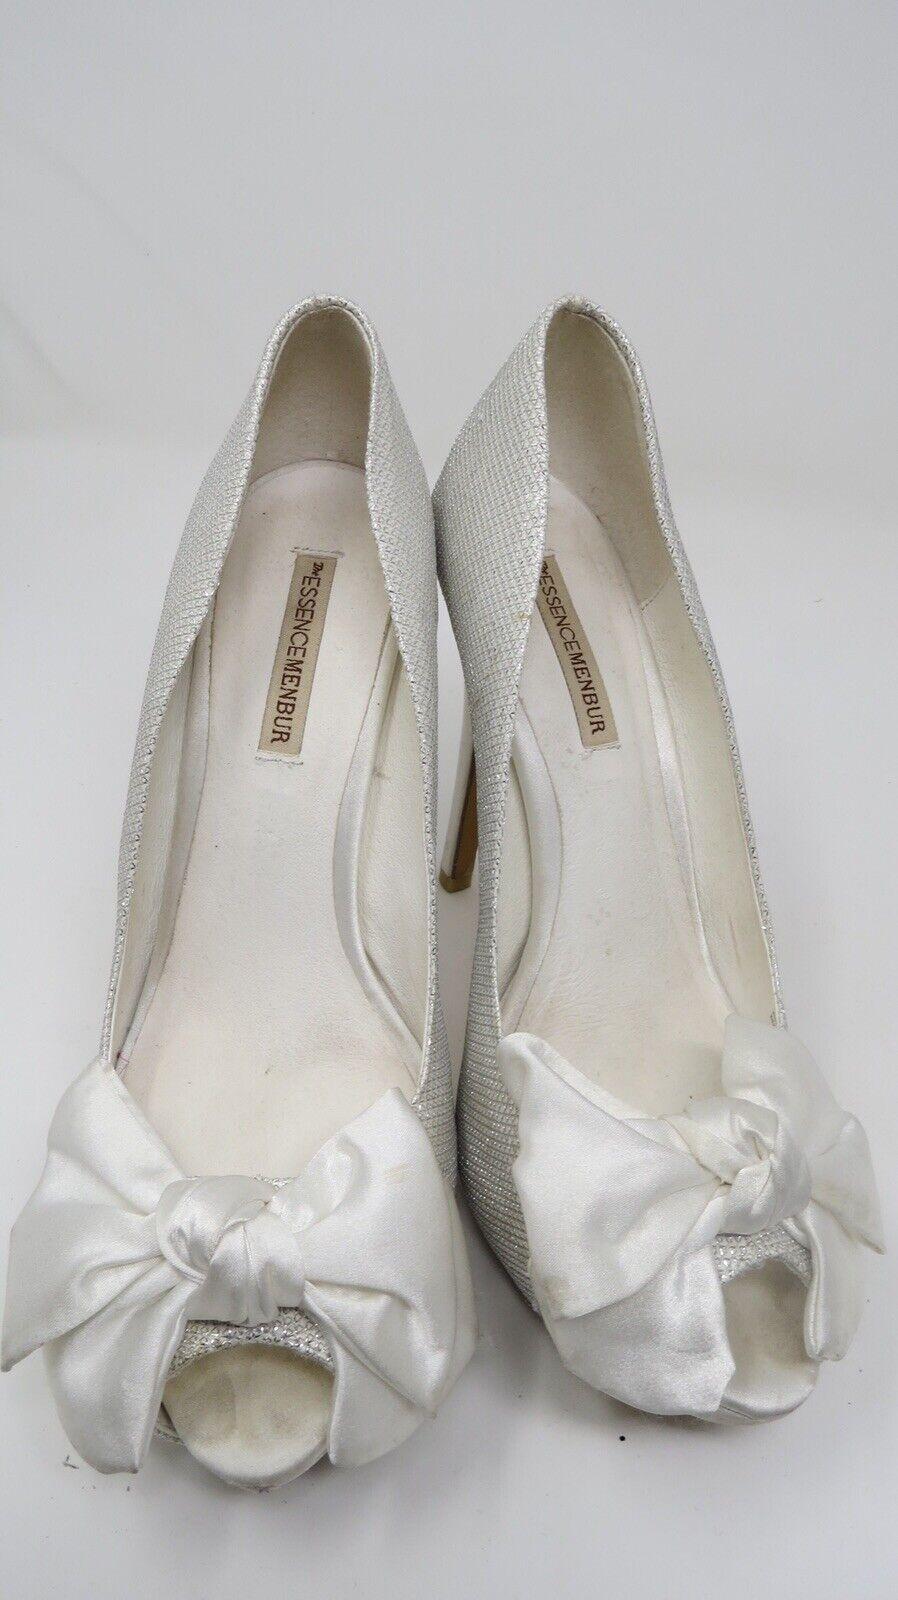 THE ESSENCEMENBUR  White color Glitter Now High Heel Open Toe Women Size  38